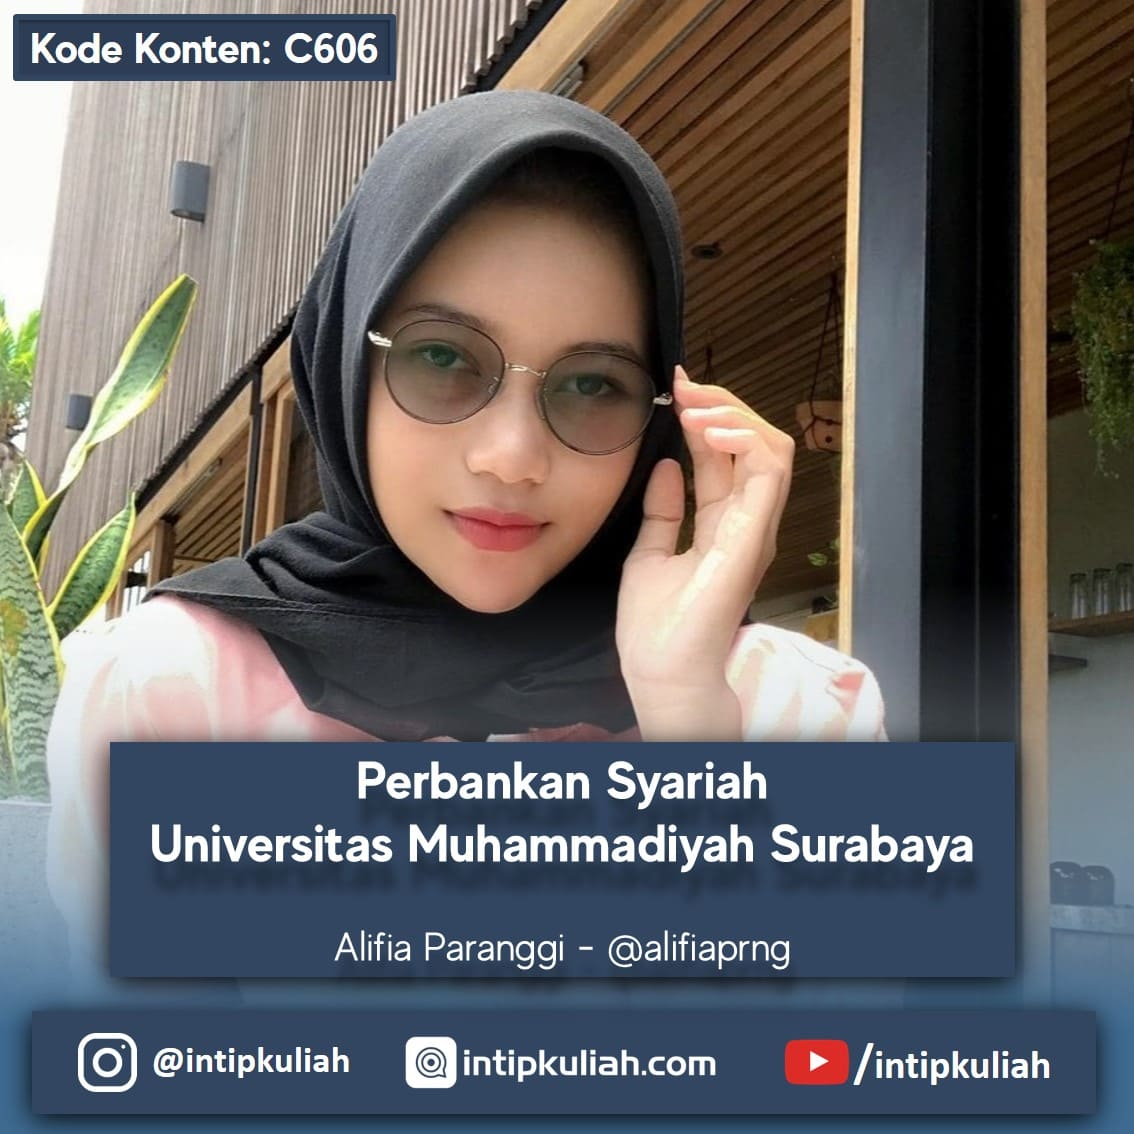 Perbankan Syariah Universitas Muhammadiyah Surabaya (Alifia)